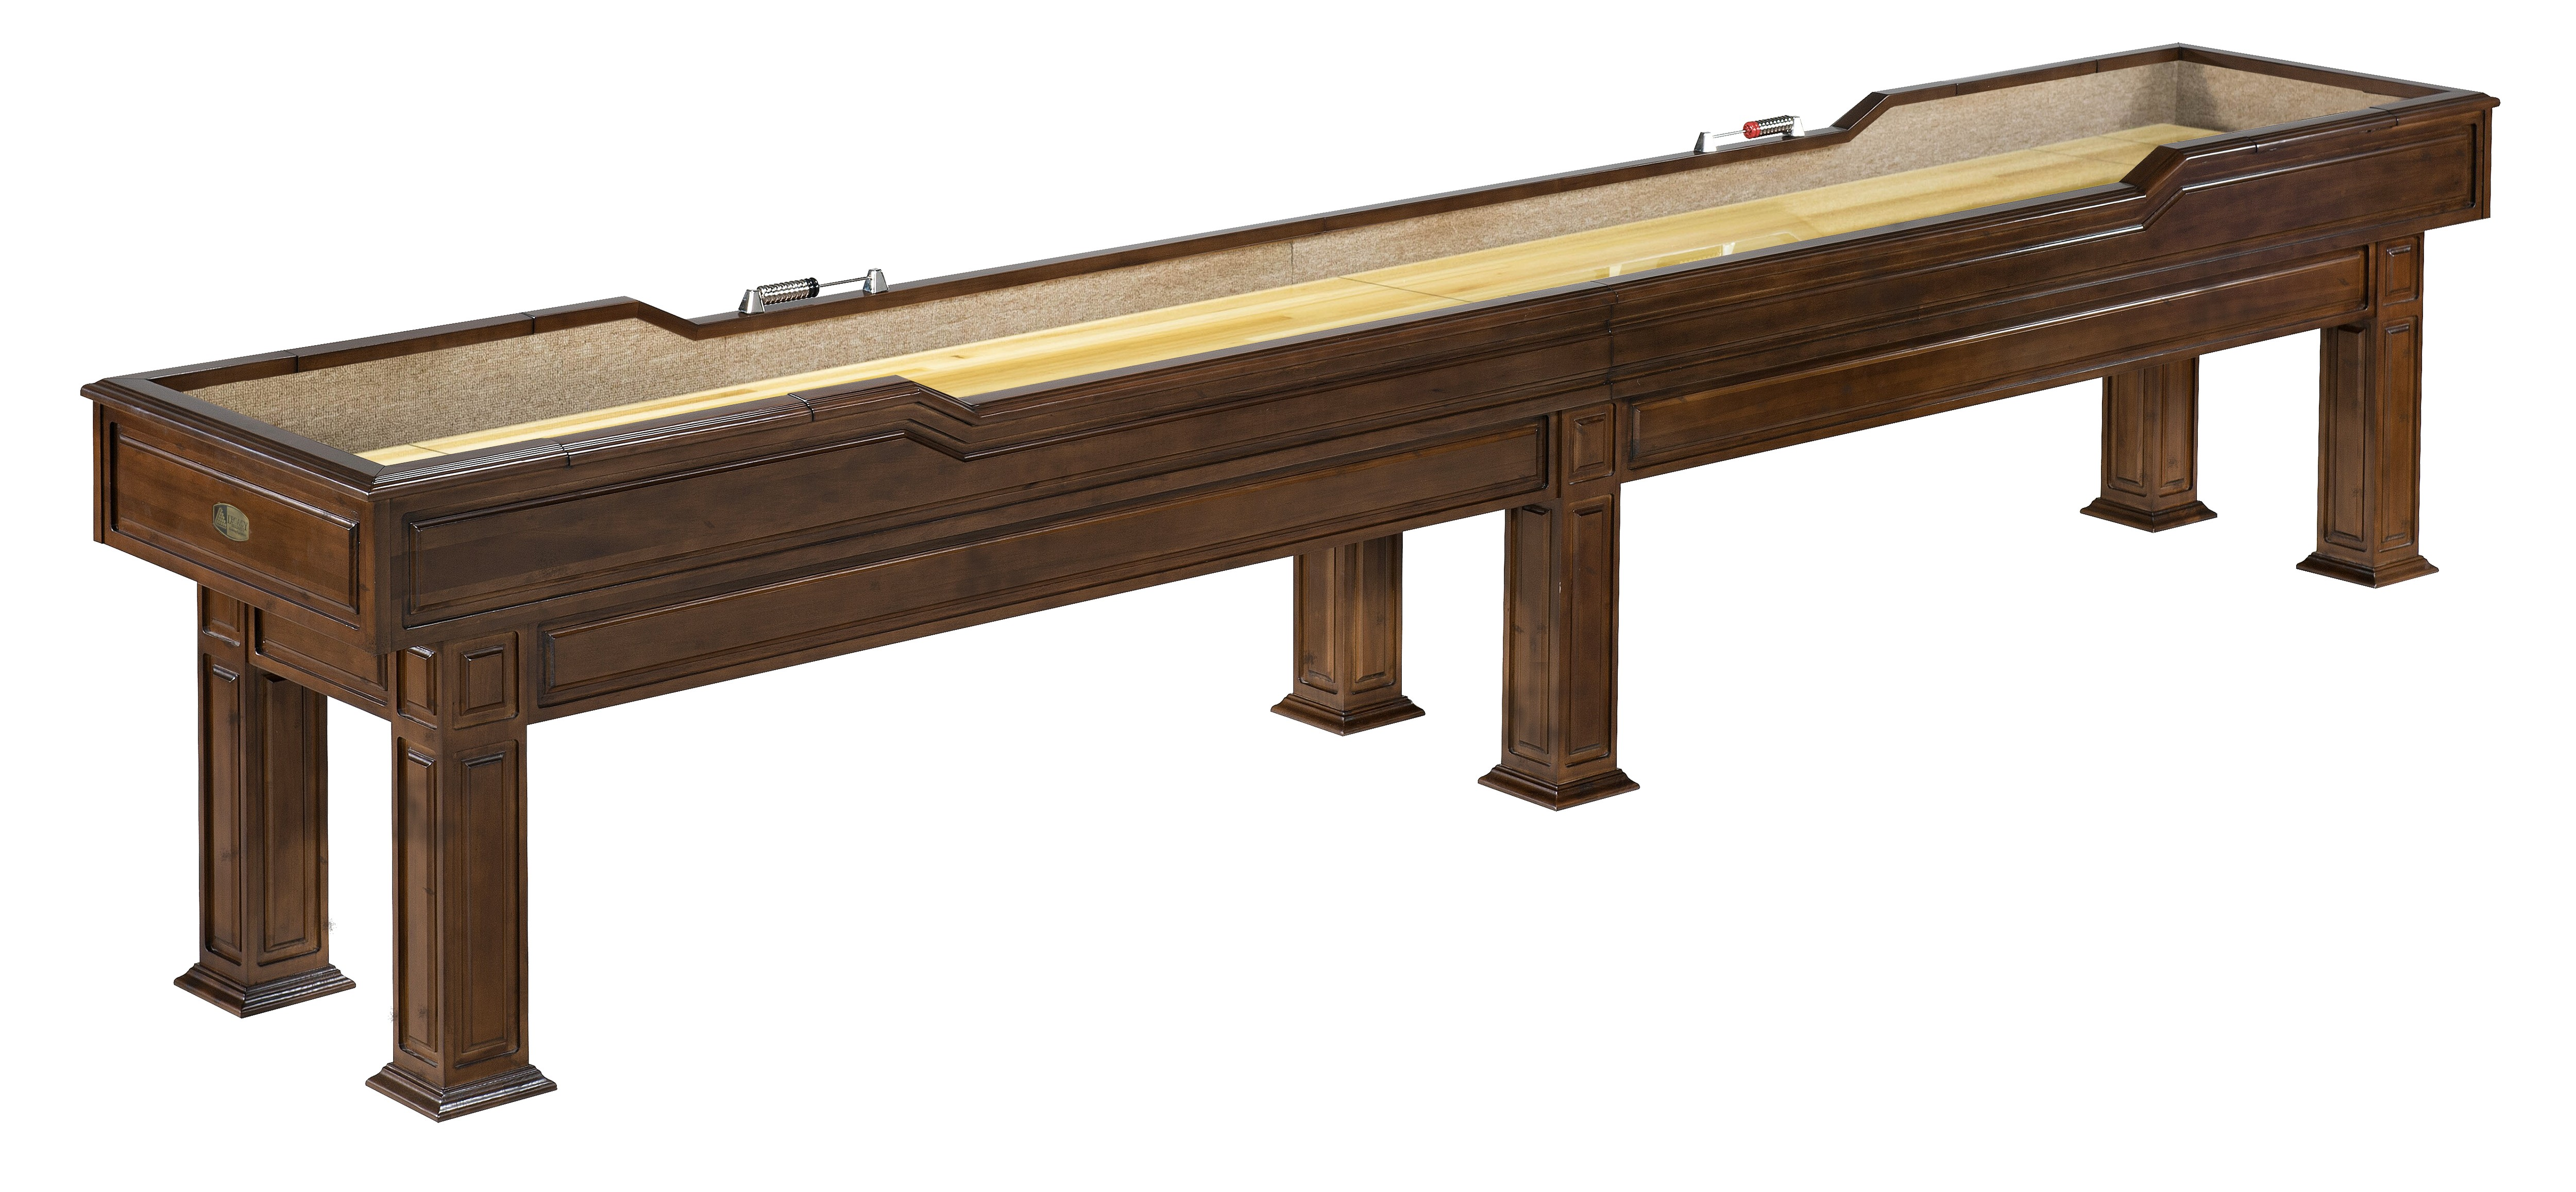 Table Shuffleboard Rules | How To Make A Shuffleboard Table | Shuffleboard  Table